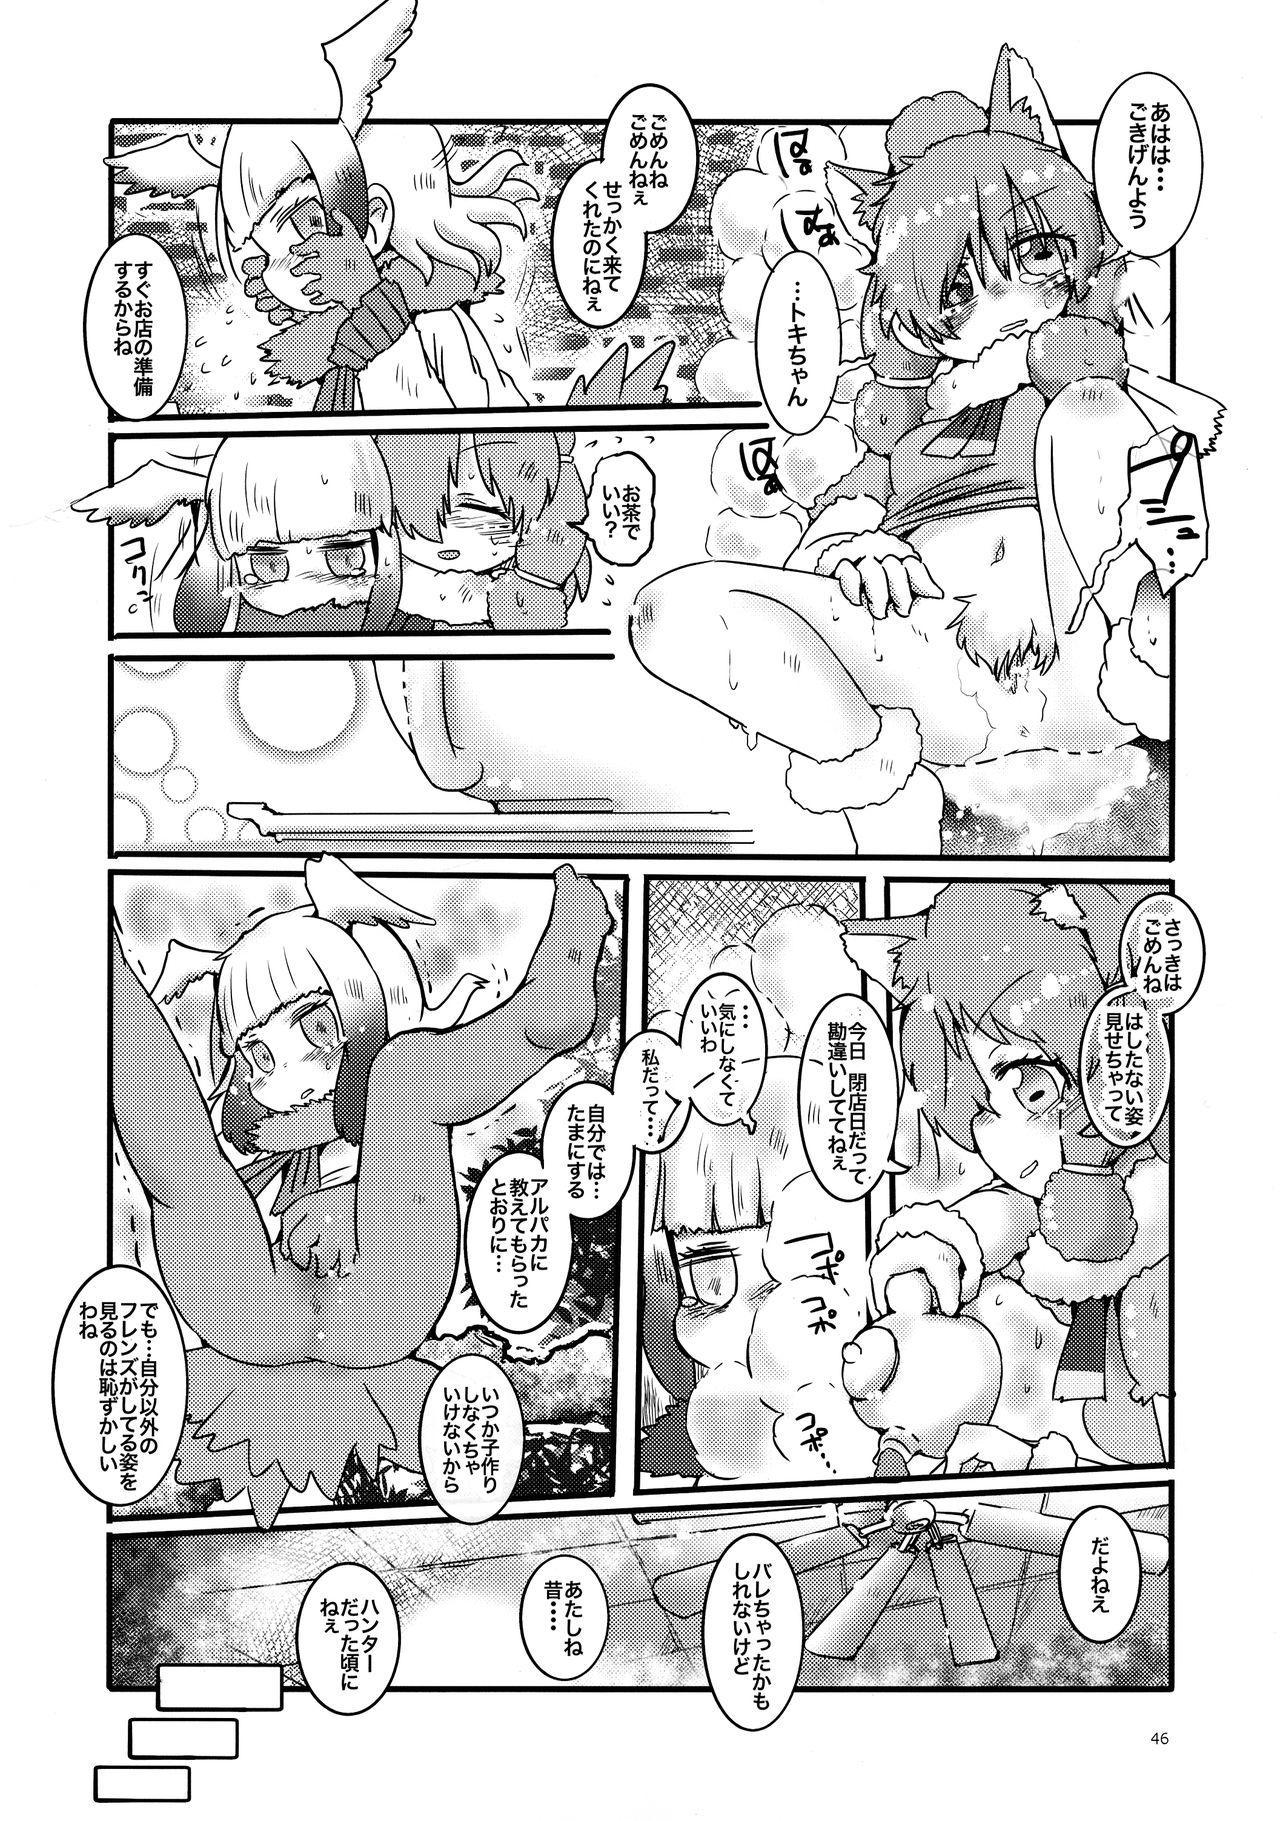 Fuwaaa! Irasshaai! Ura Iyashi no Alpaca-san Goudou 45